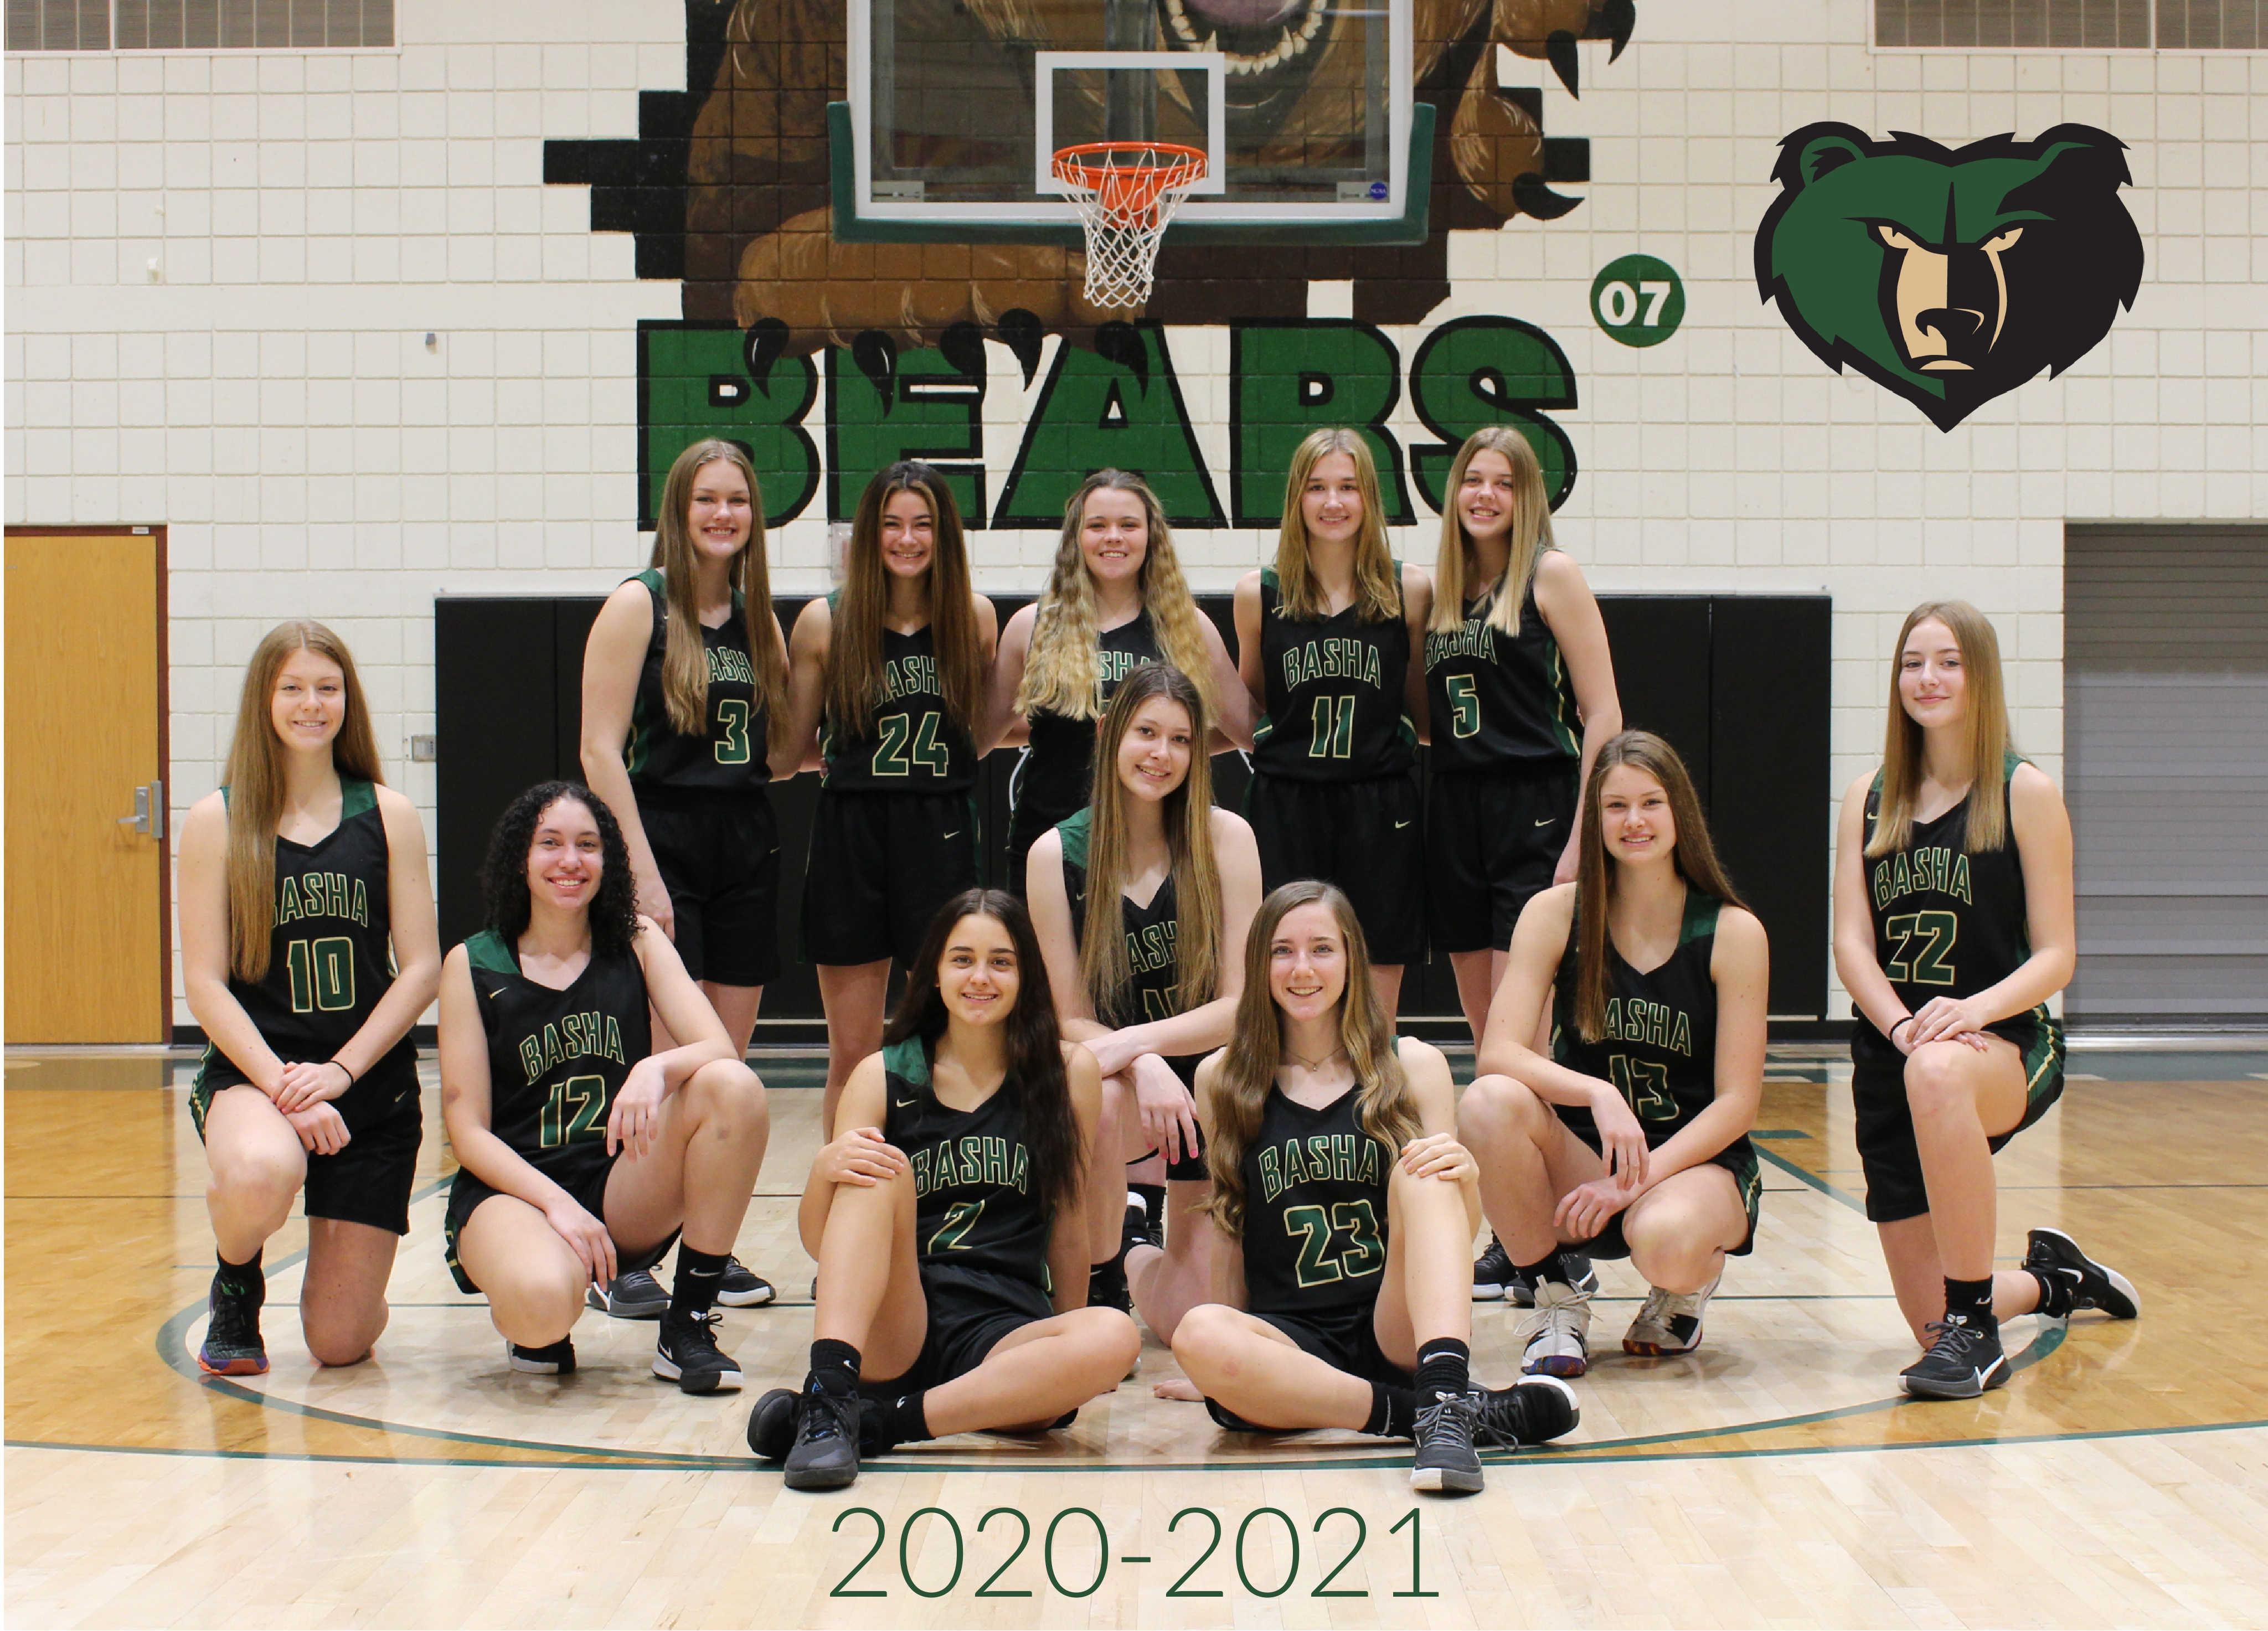 2020 - 2021 Basha Girls Basketball - Support Your Bears!